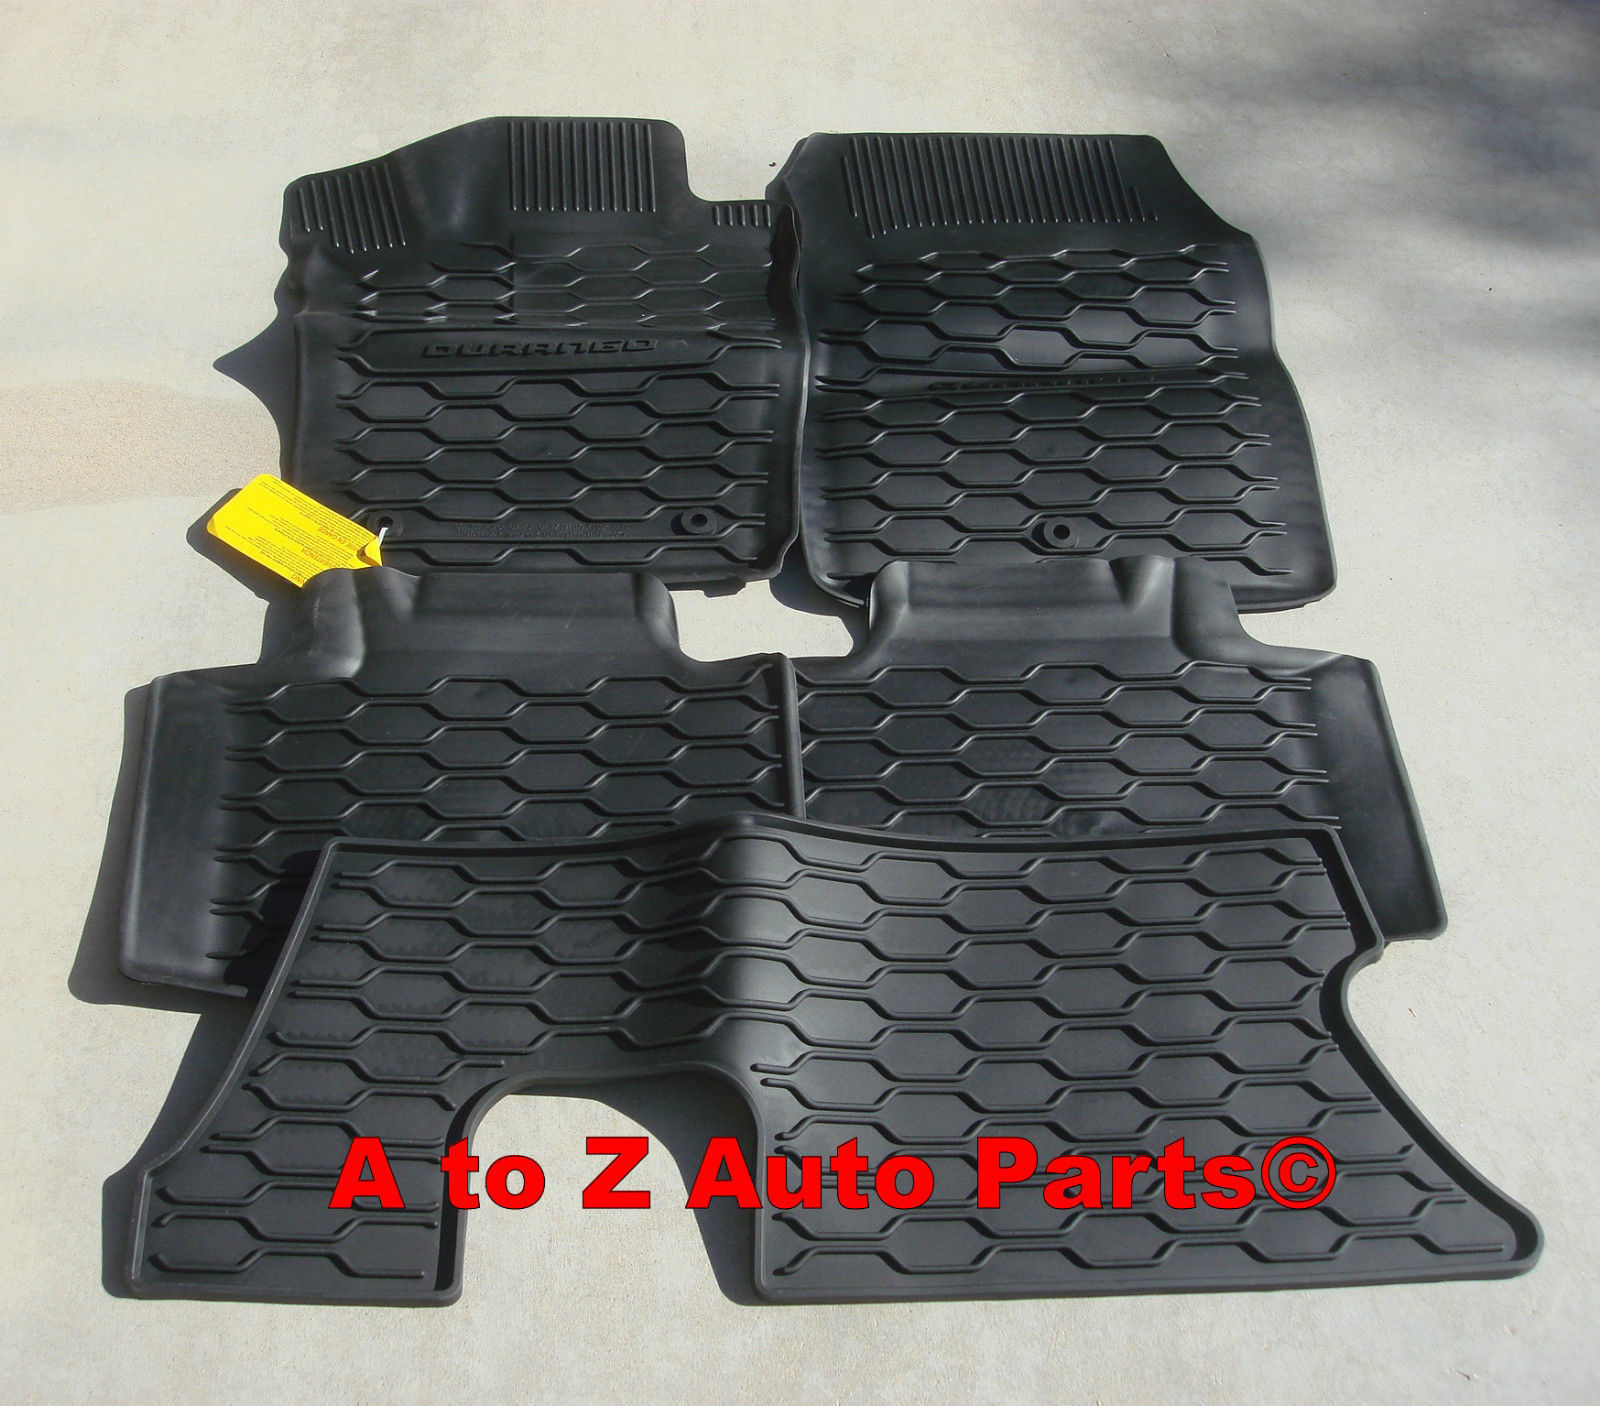 Fit 2011-2018 Dodge Challenger Car Floor Mats Front /& Rear Black Slush Mat